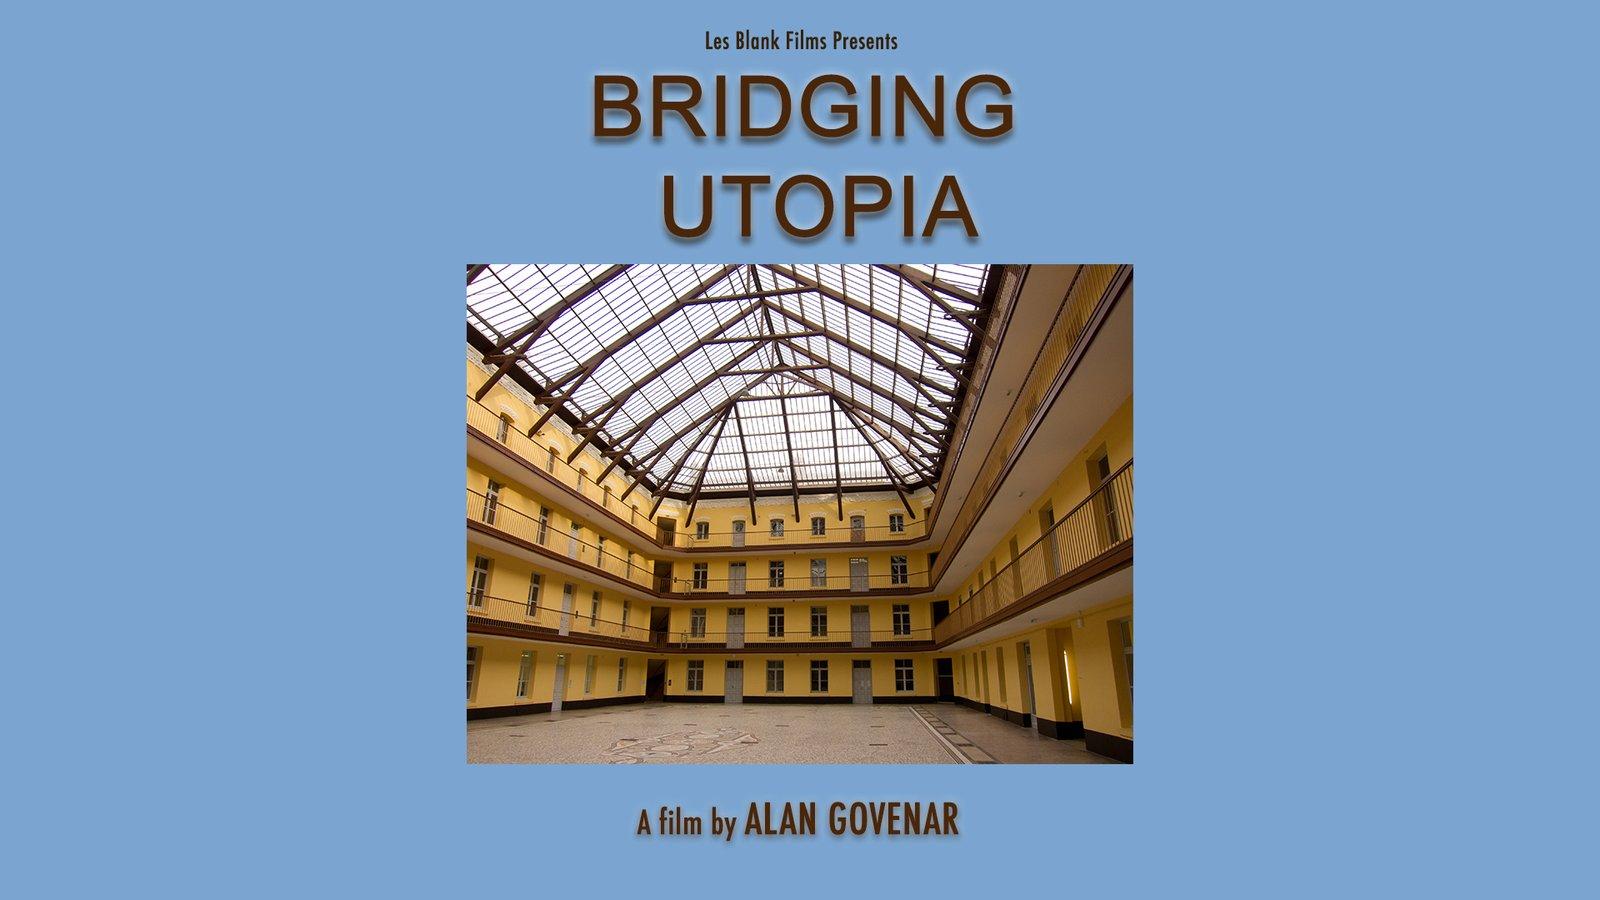 Bridging Utopia - Two Utopian Experiments